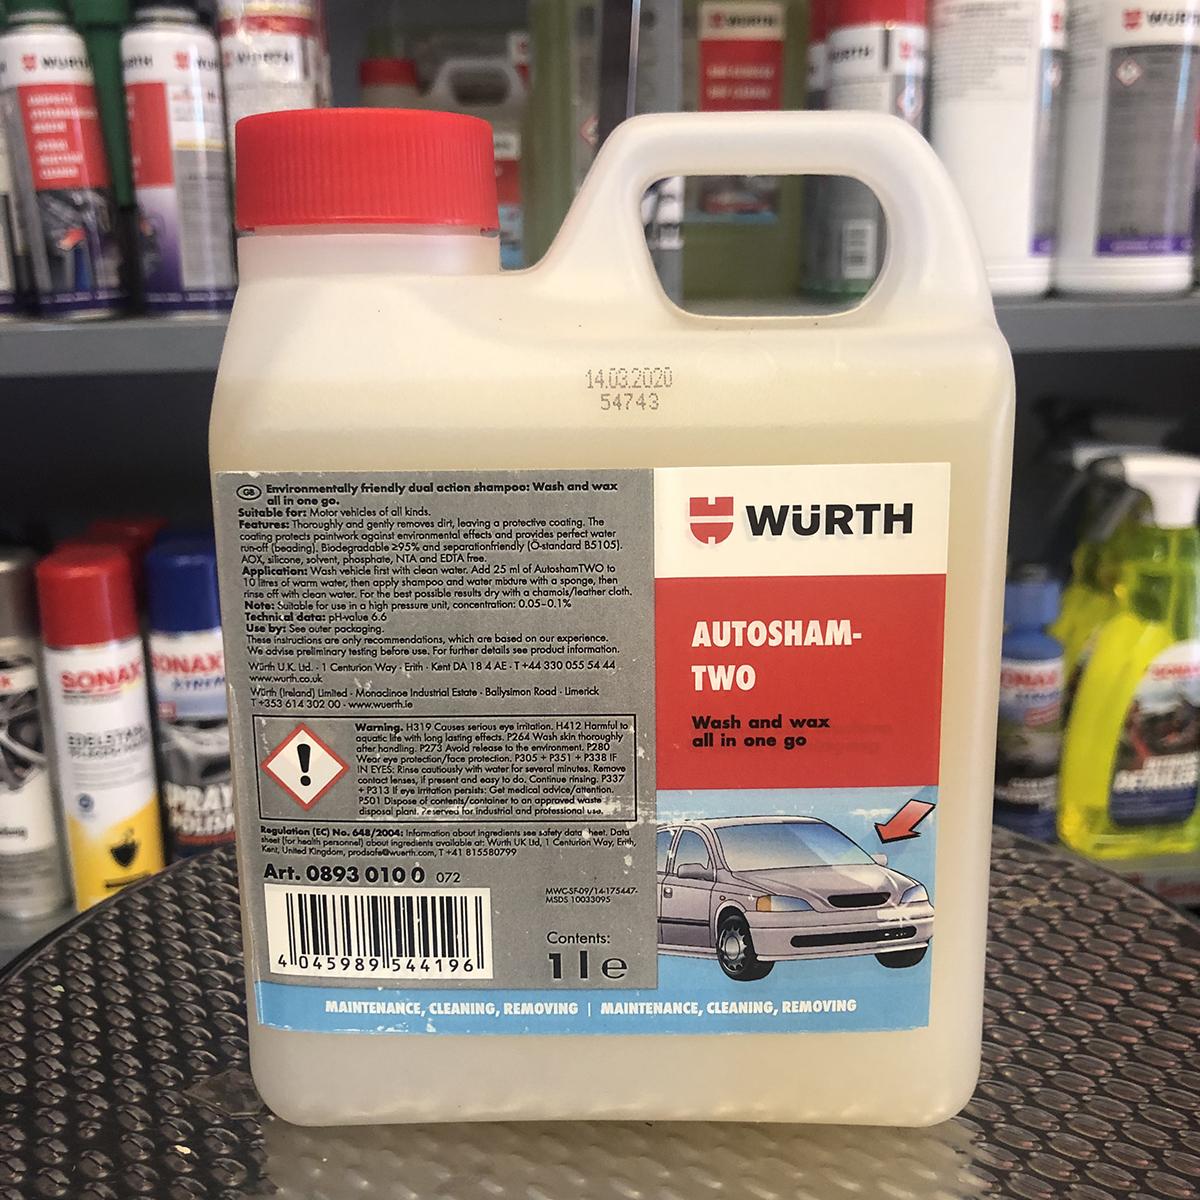 Nước rửa xe Wurth Autosham-Two 0893 0100 Wash and wax all in one go 1000ml